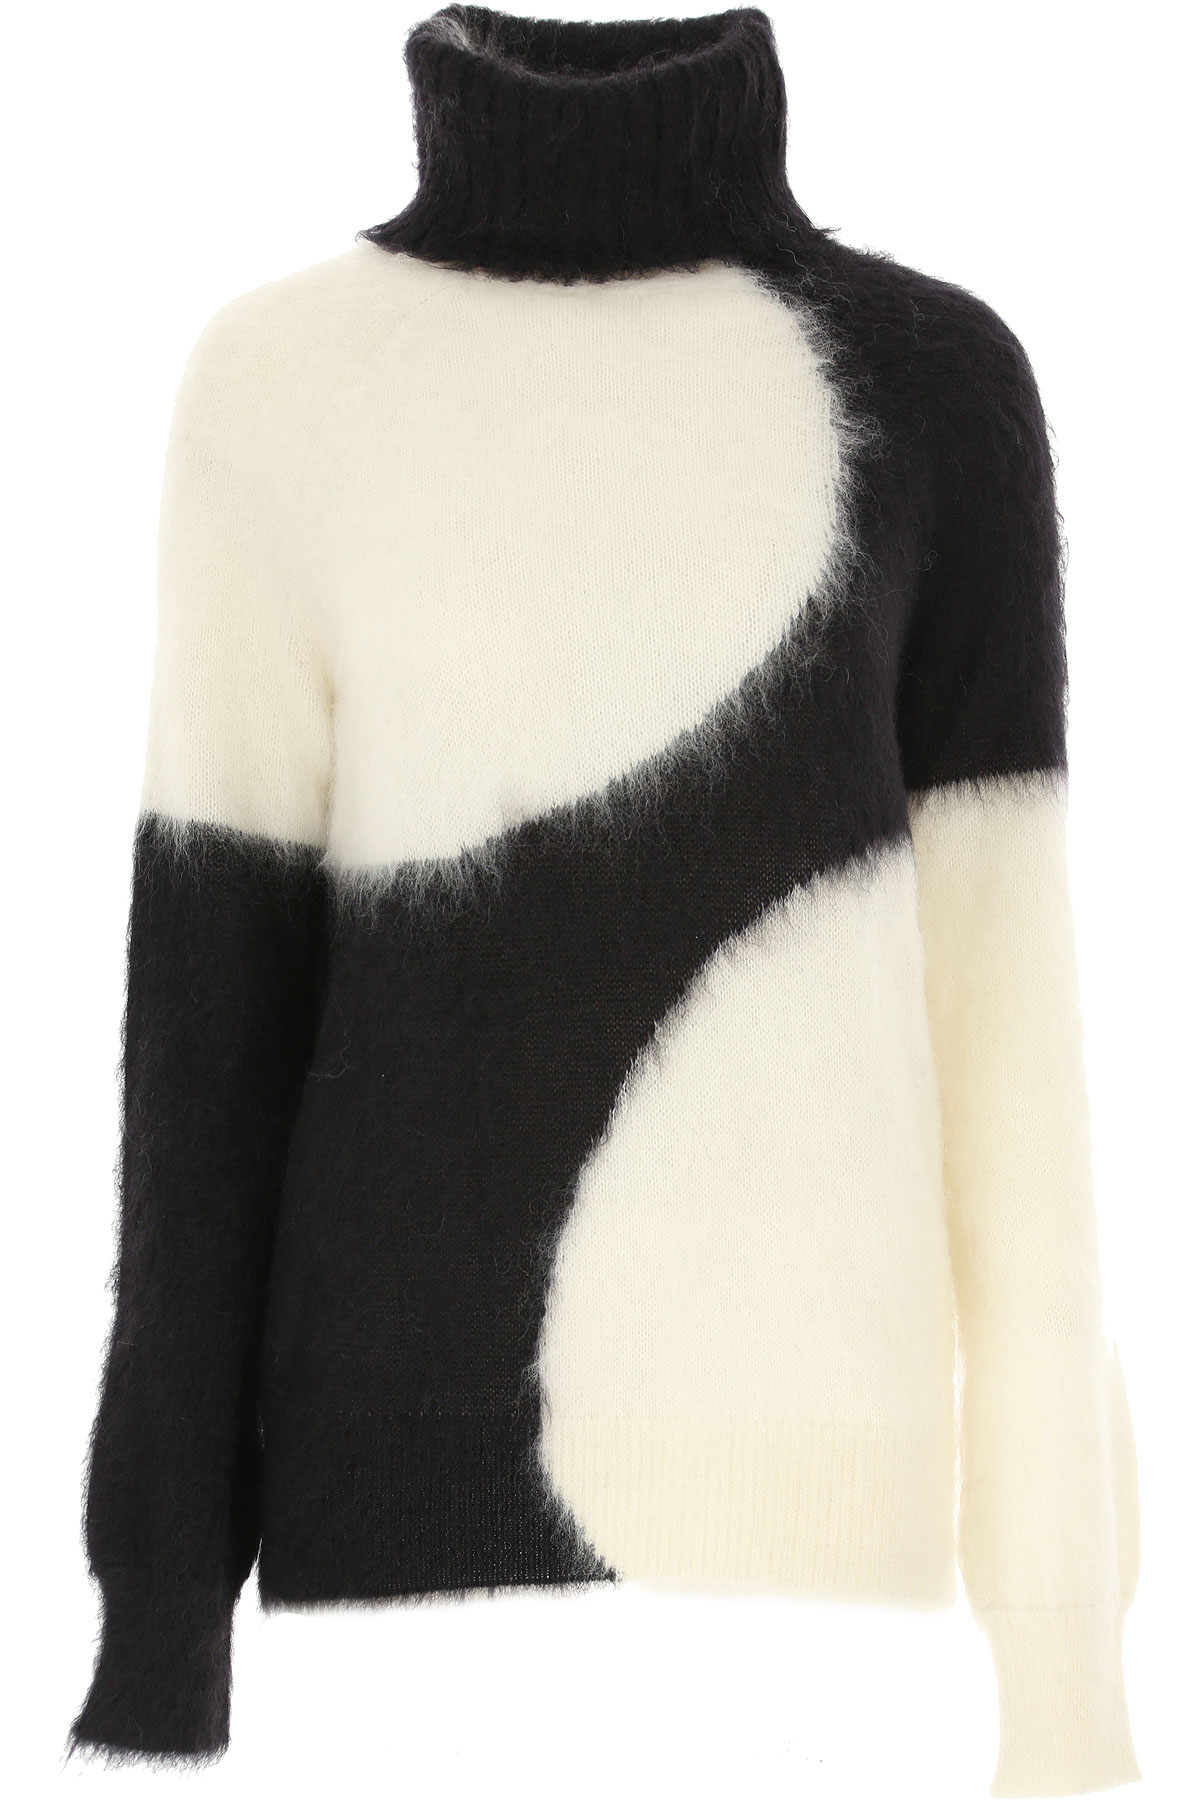 Gianluca Capannolo Sweater for Women Jumper On Sale, White, Mohair, 2019, 2 4 6